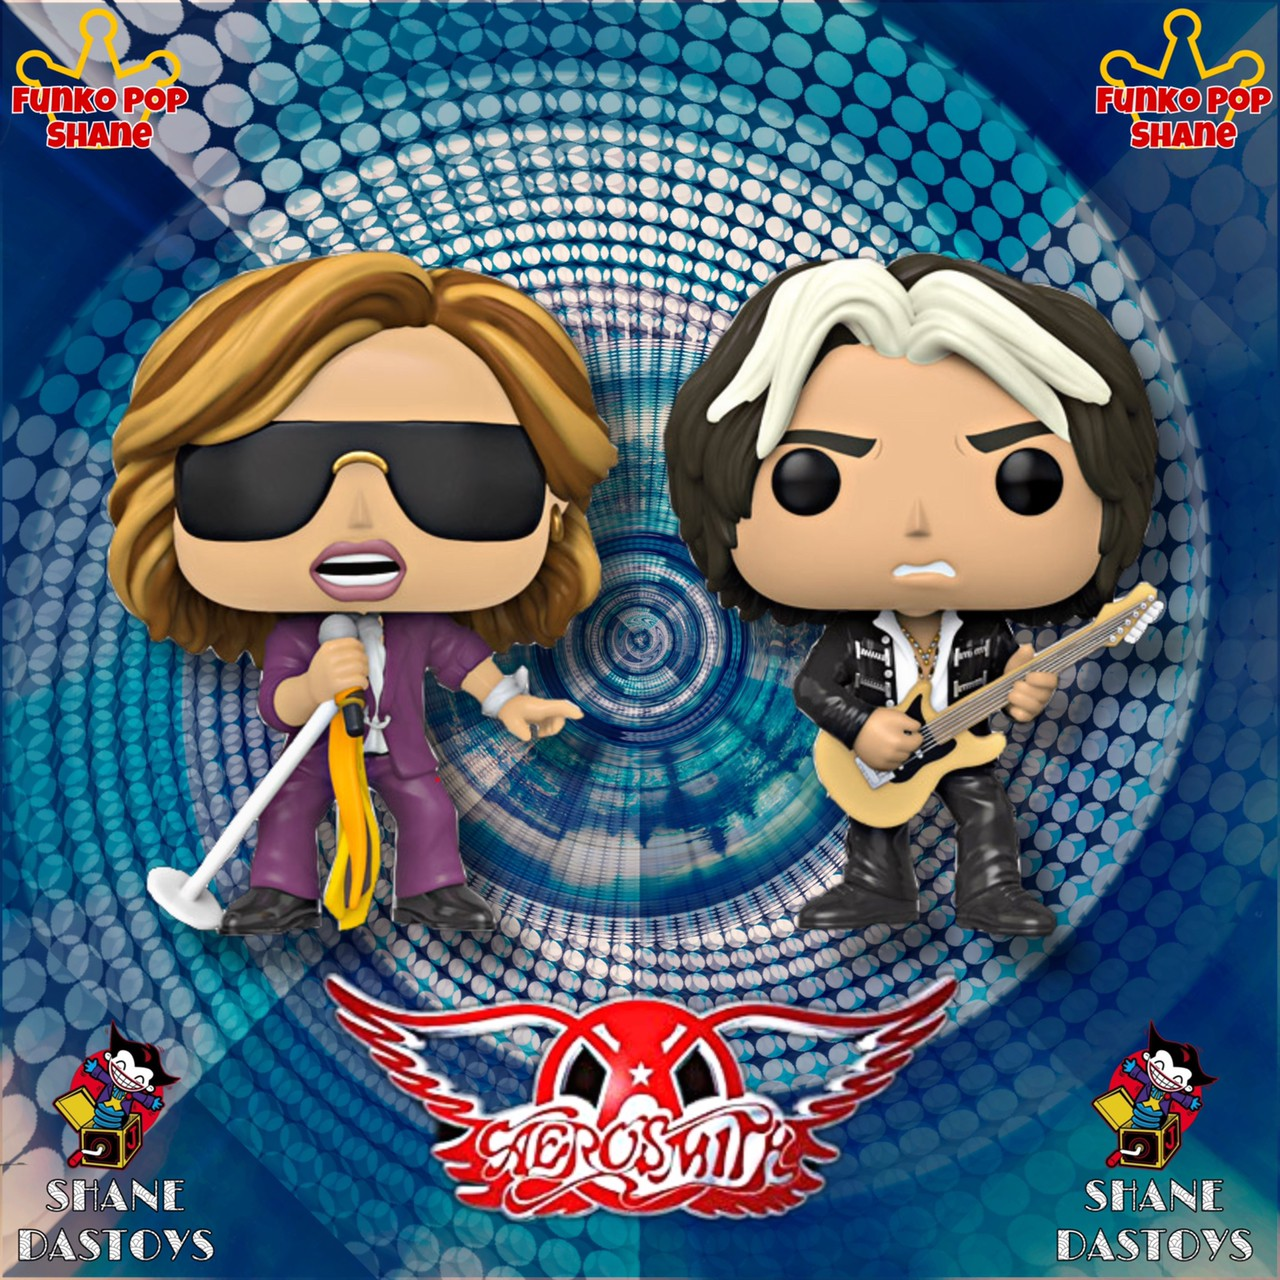 Funko Pop! Aerosmith